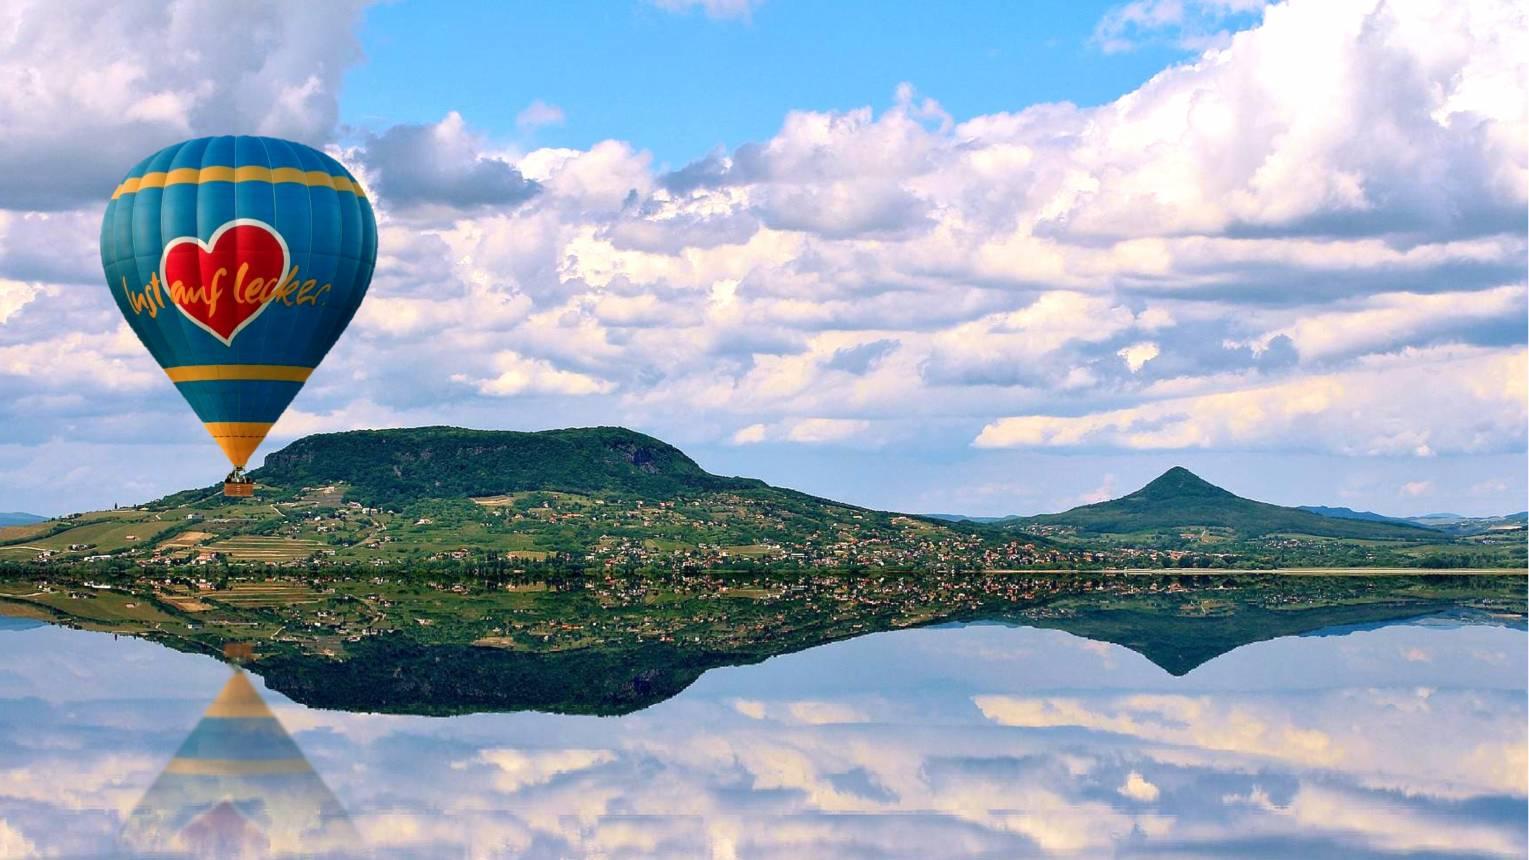 Suhanj hőlégballonnal Siófok felett